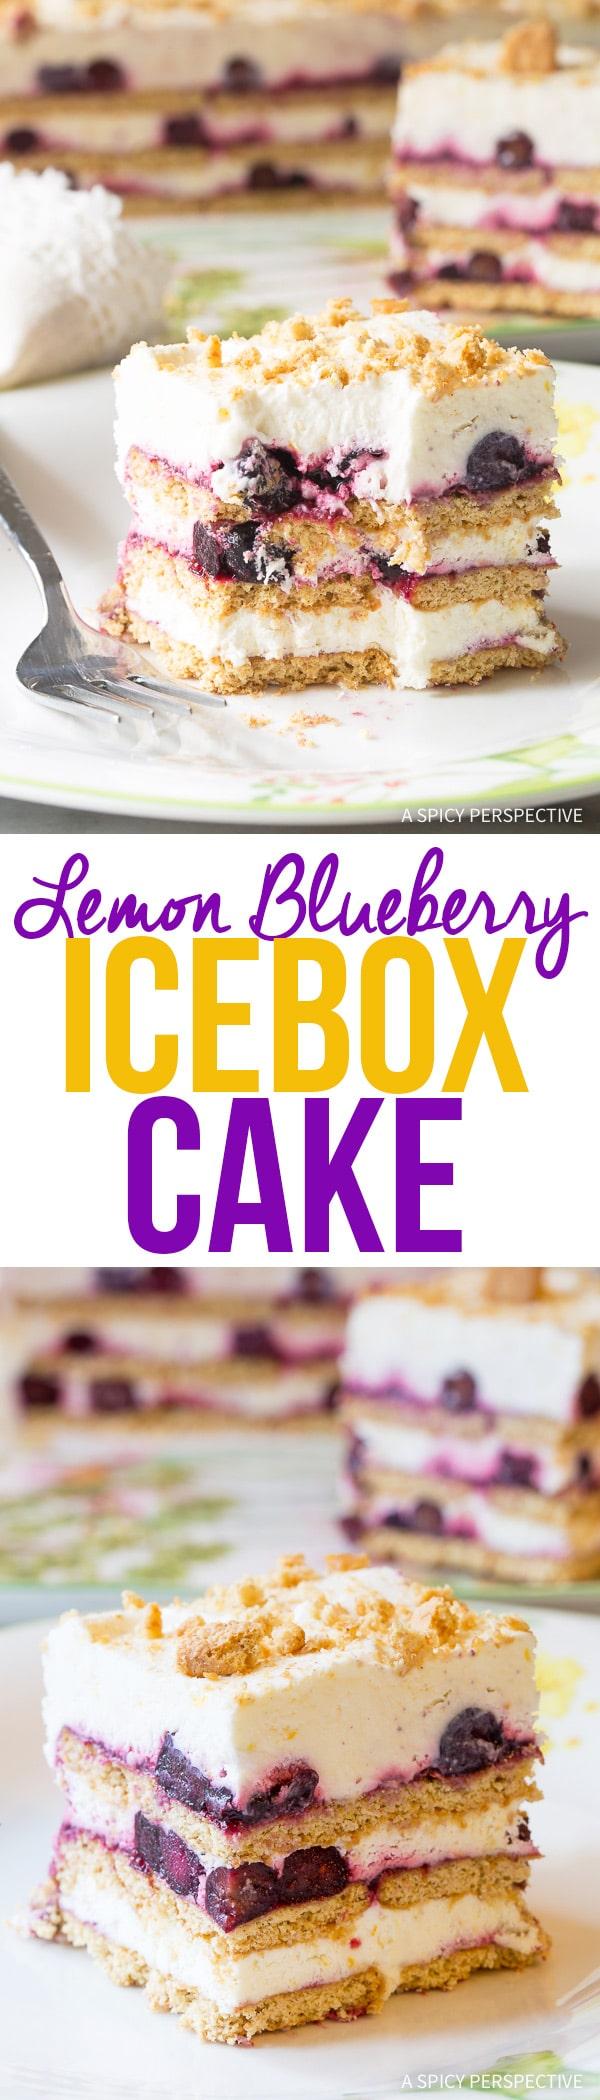 Creamy Lemon Blueberry Icebox Cake Recipe for Summer!